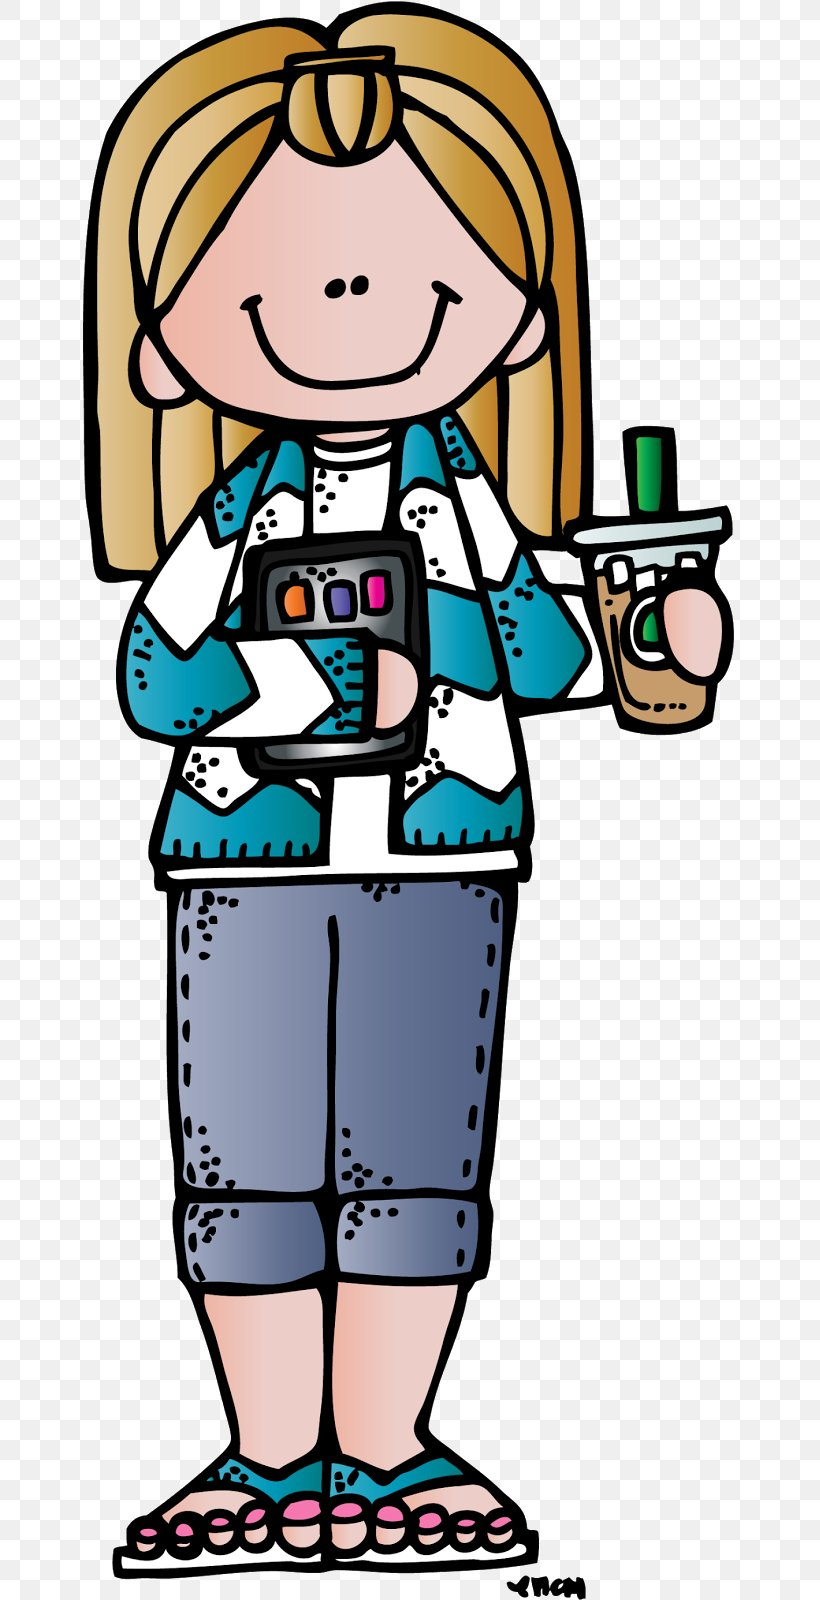 Student Clip Art For Summer Teacher Education Clip Art, PNG, 655x1600px, Student, Area, Art, Artwork, Class Download Free